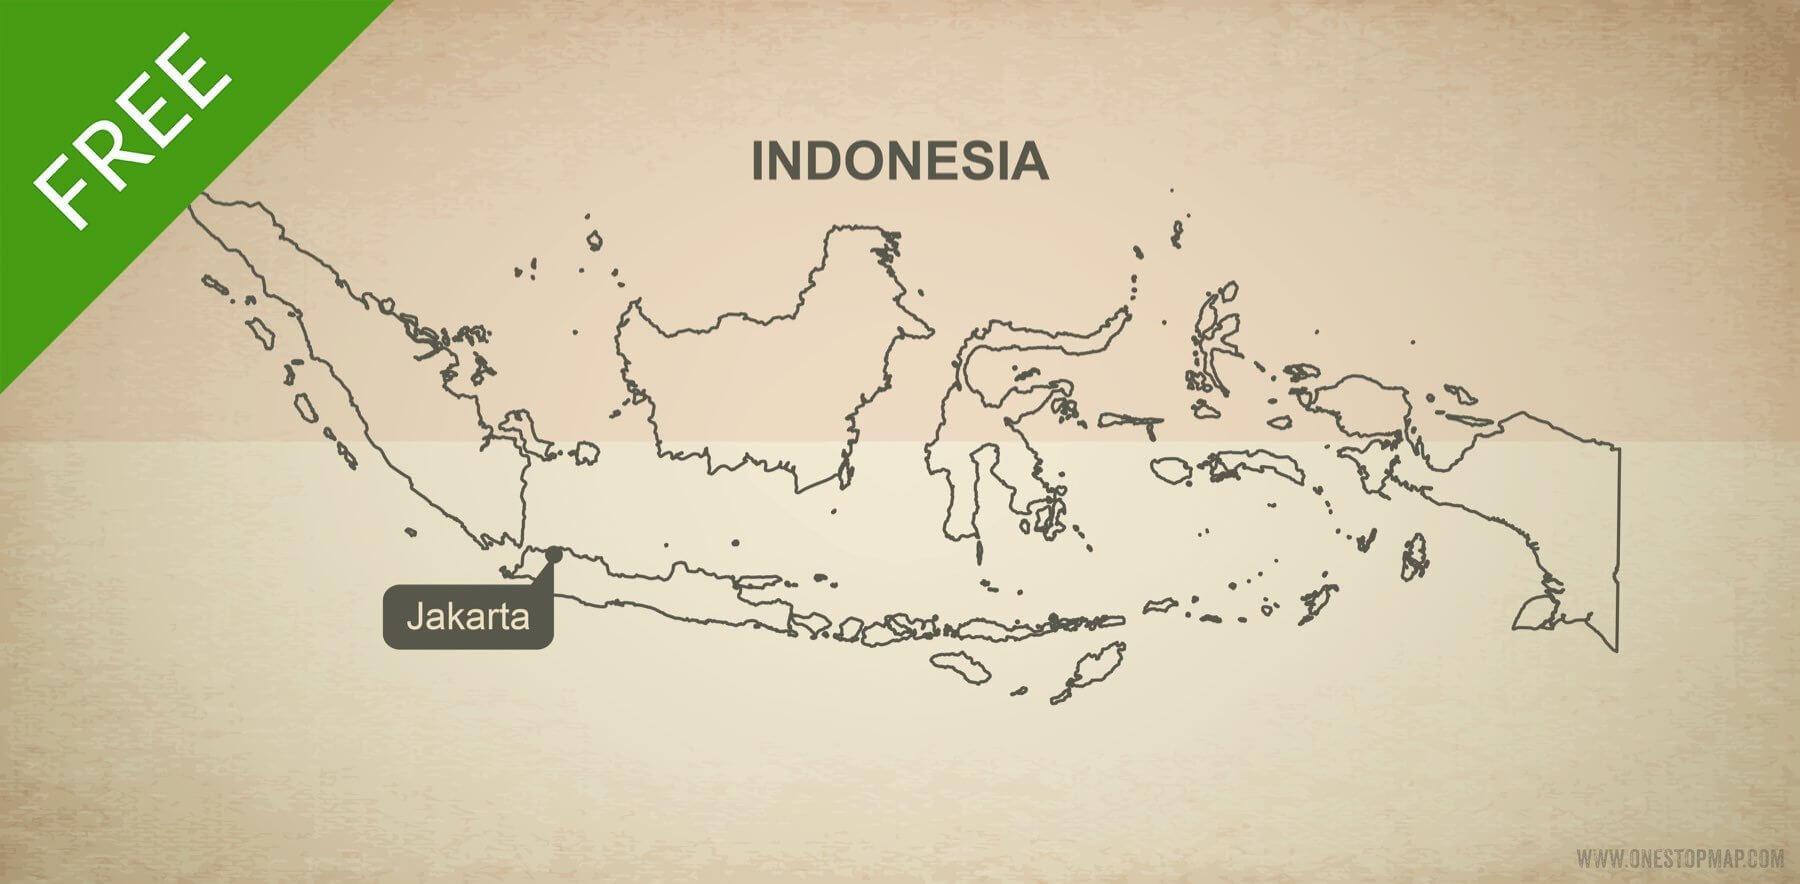 Apakah anda mencari gambar tentang logo. Peta Indonesia Hd Paimin Gambar